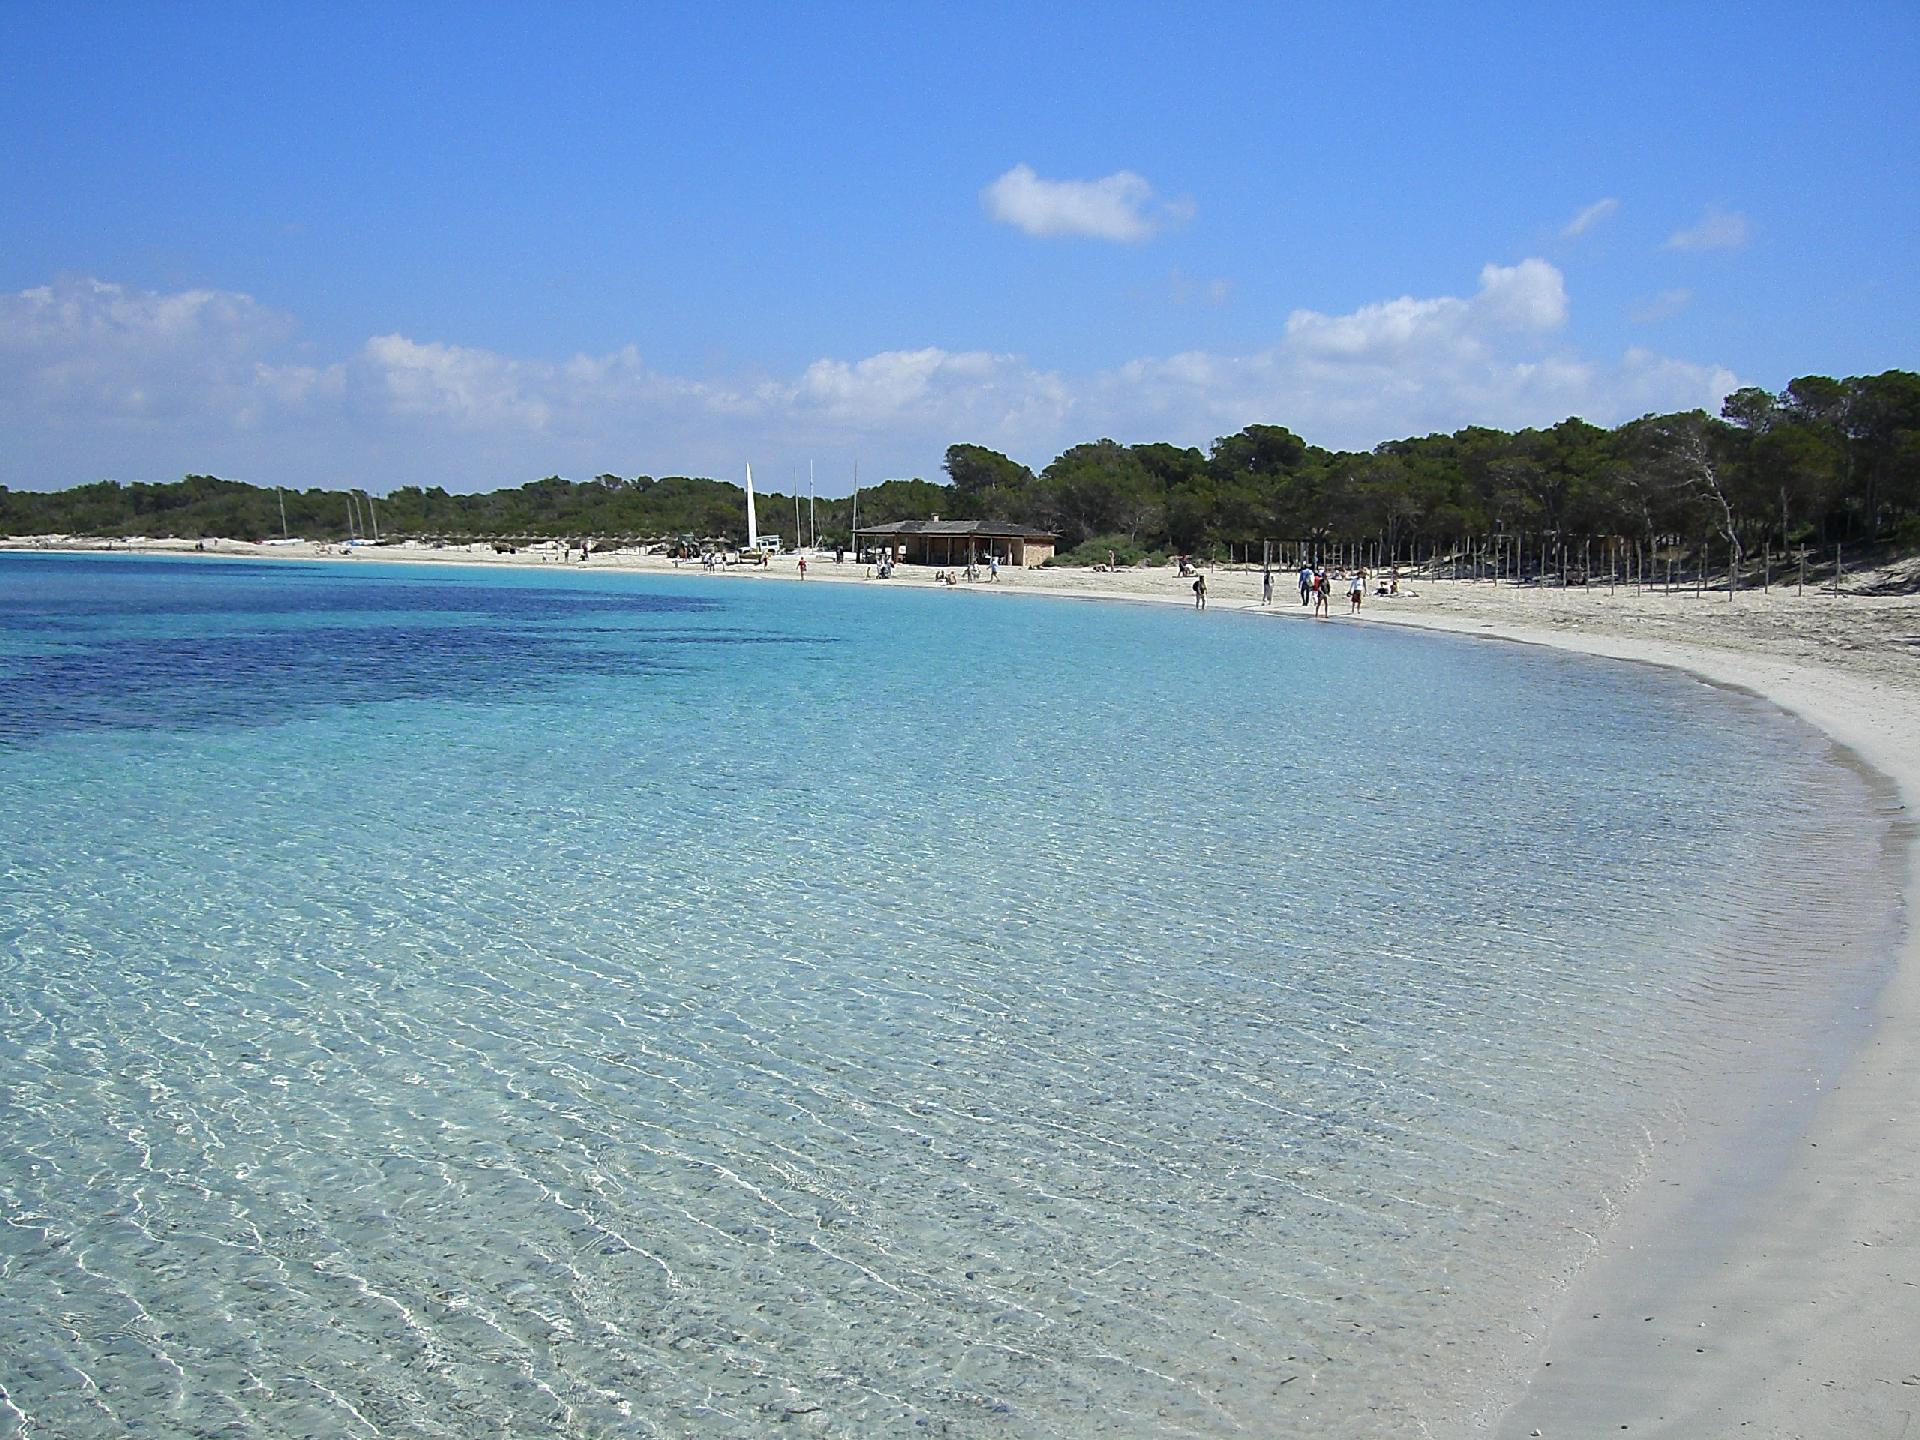 Ferienhaus für 6 Personen ca 105 m² in Sa Rapita Mallorca Südküste von Mallorca